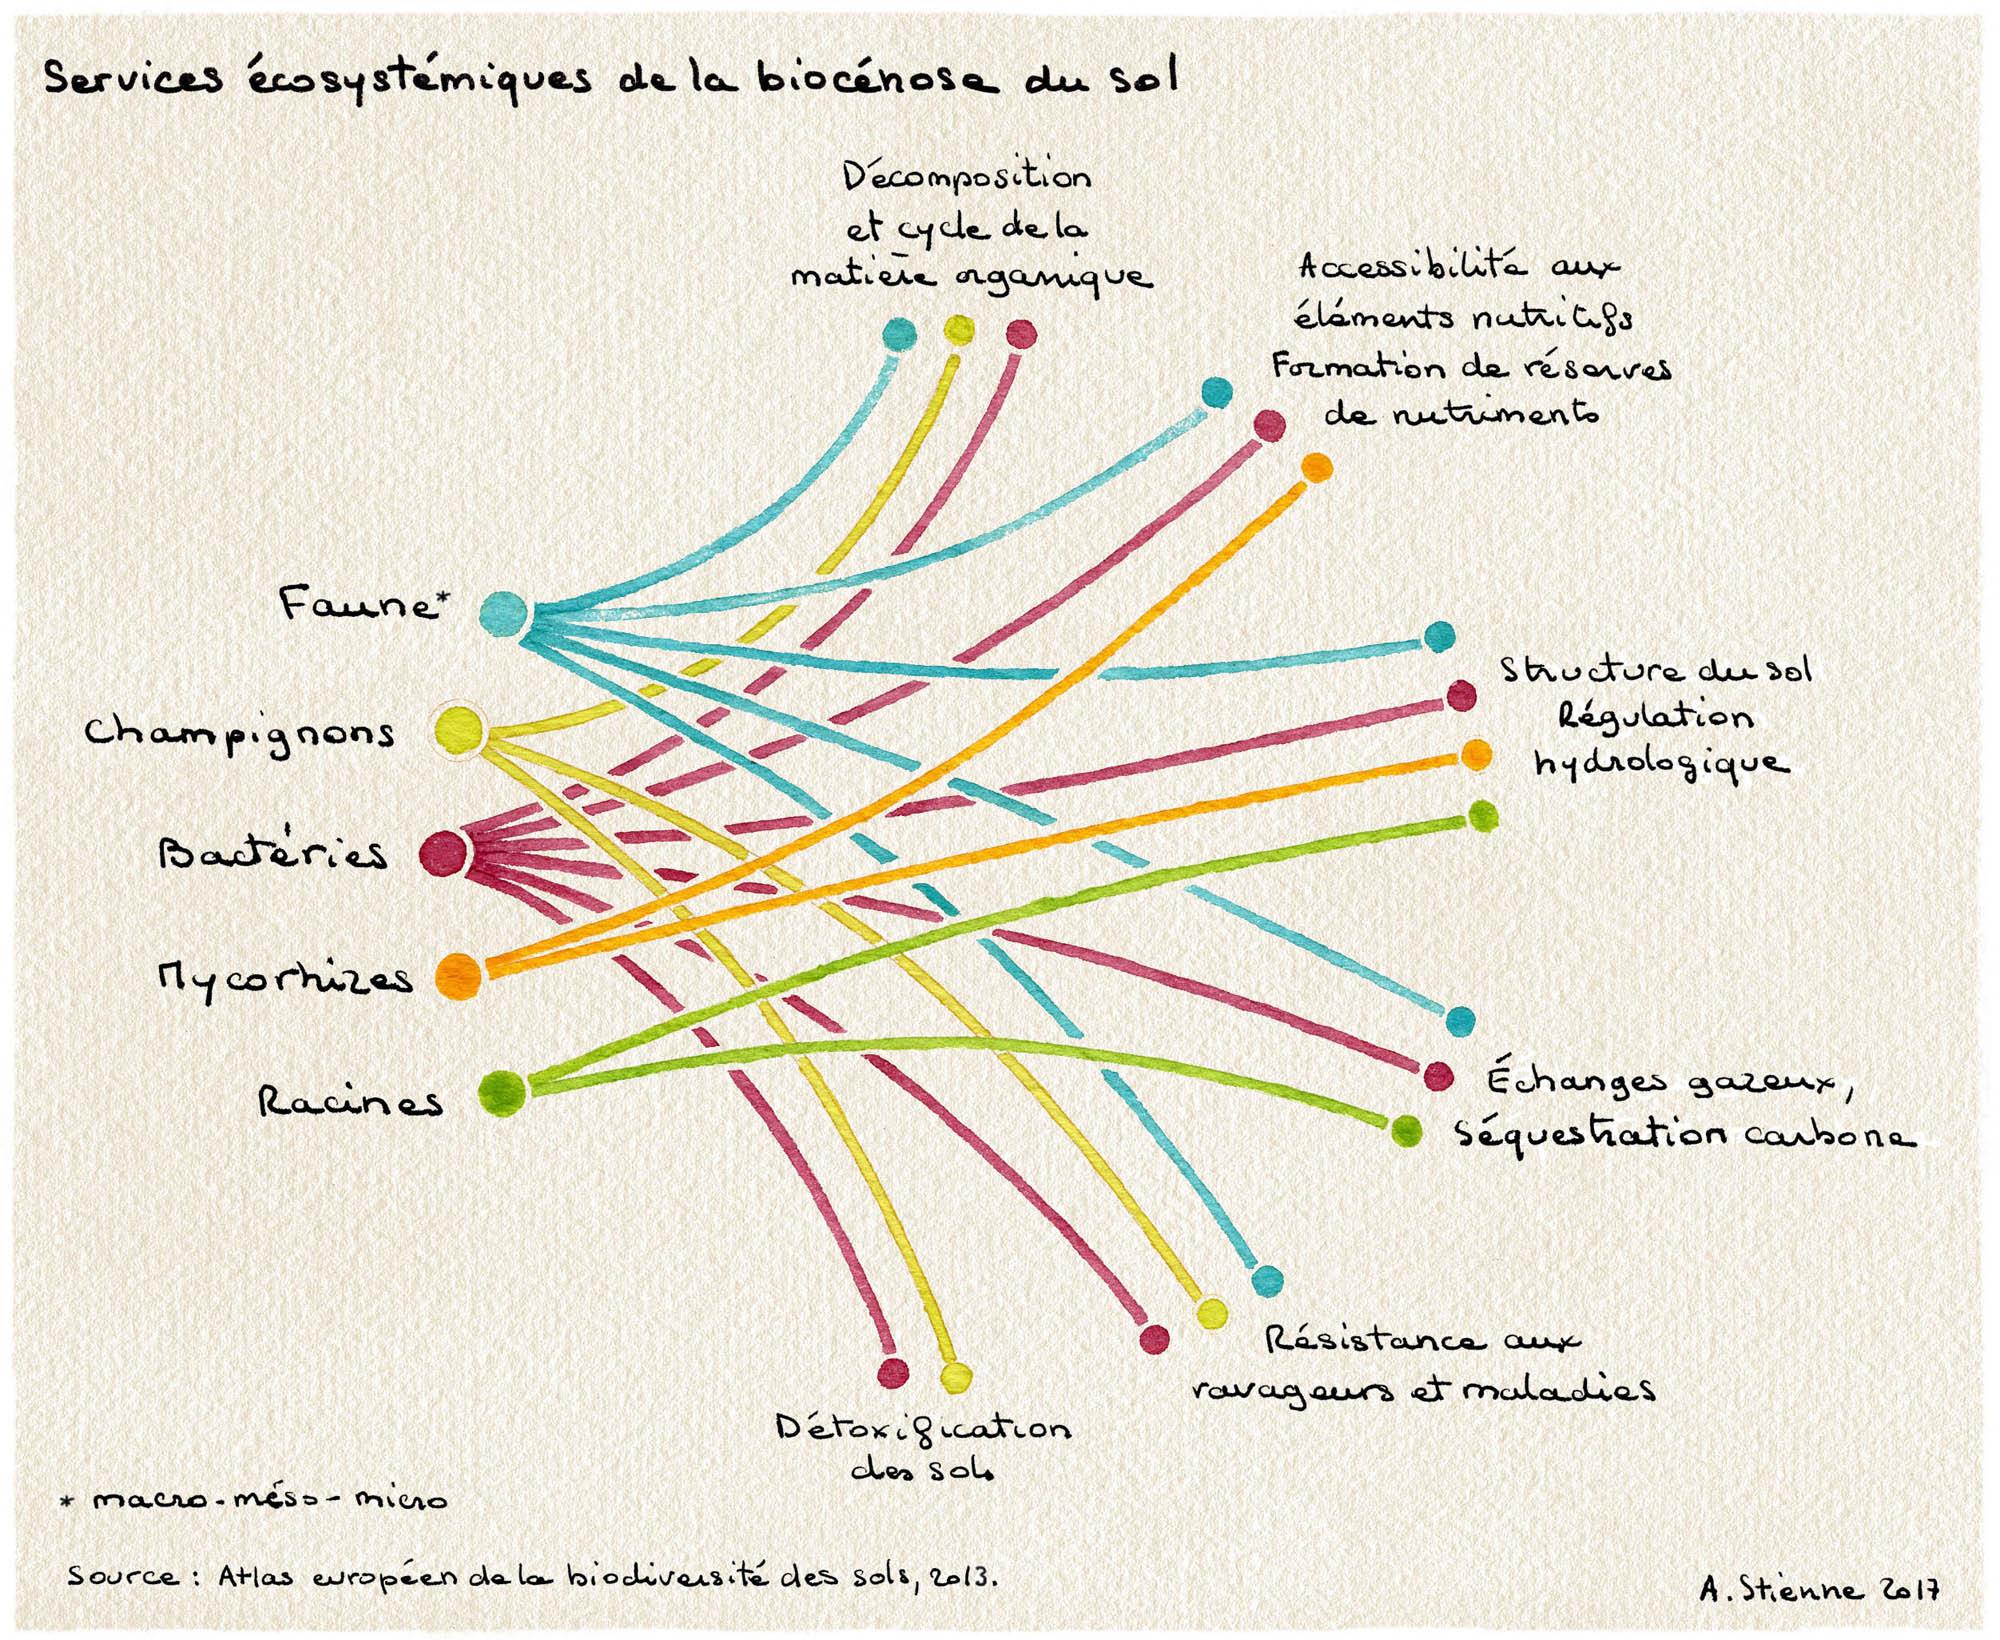 Stienne - biocenose du sol - jardin-therapeutique - img3